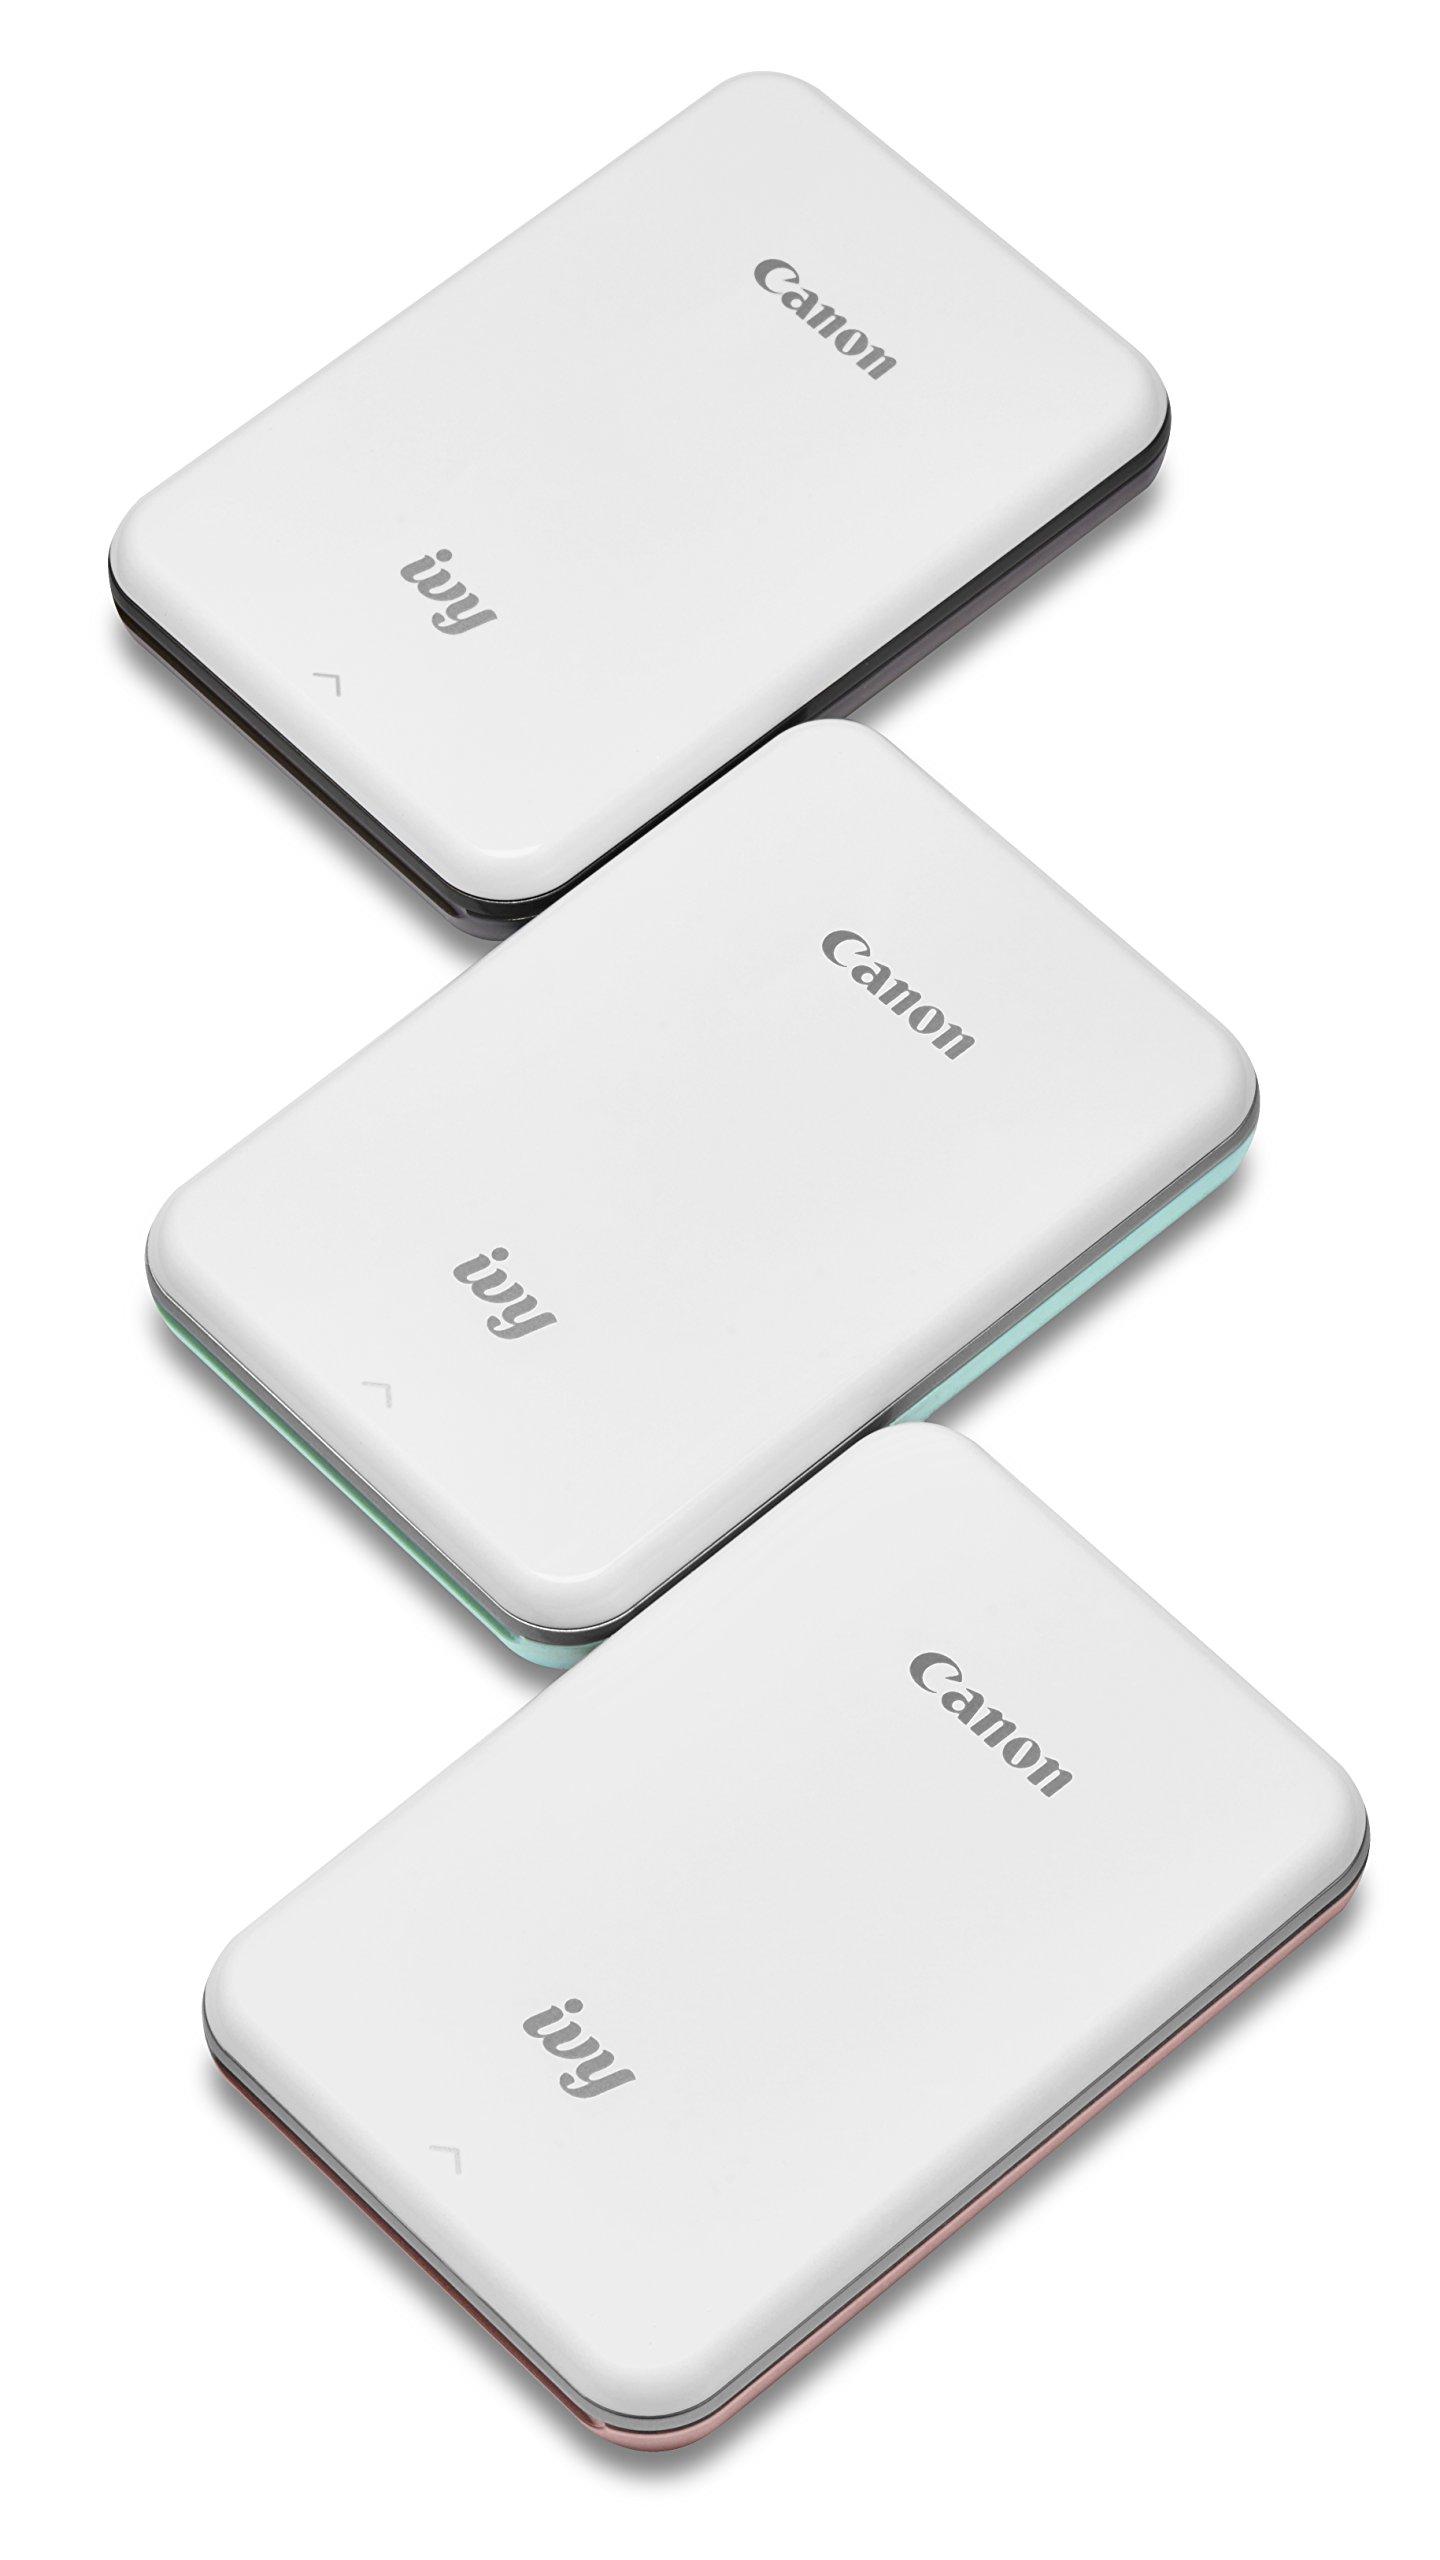 Canon IVY Mobile Mini Photo Printer through Bluetooth(R), Slate Gray by Canon (Image #8)